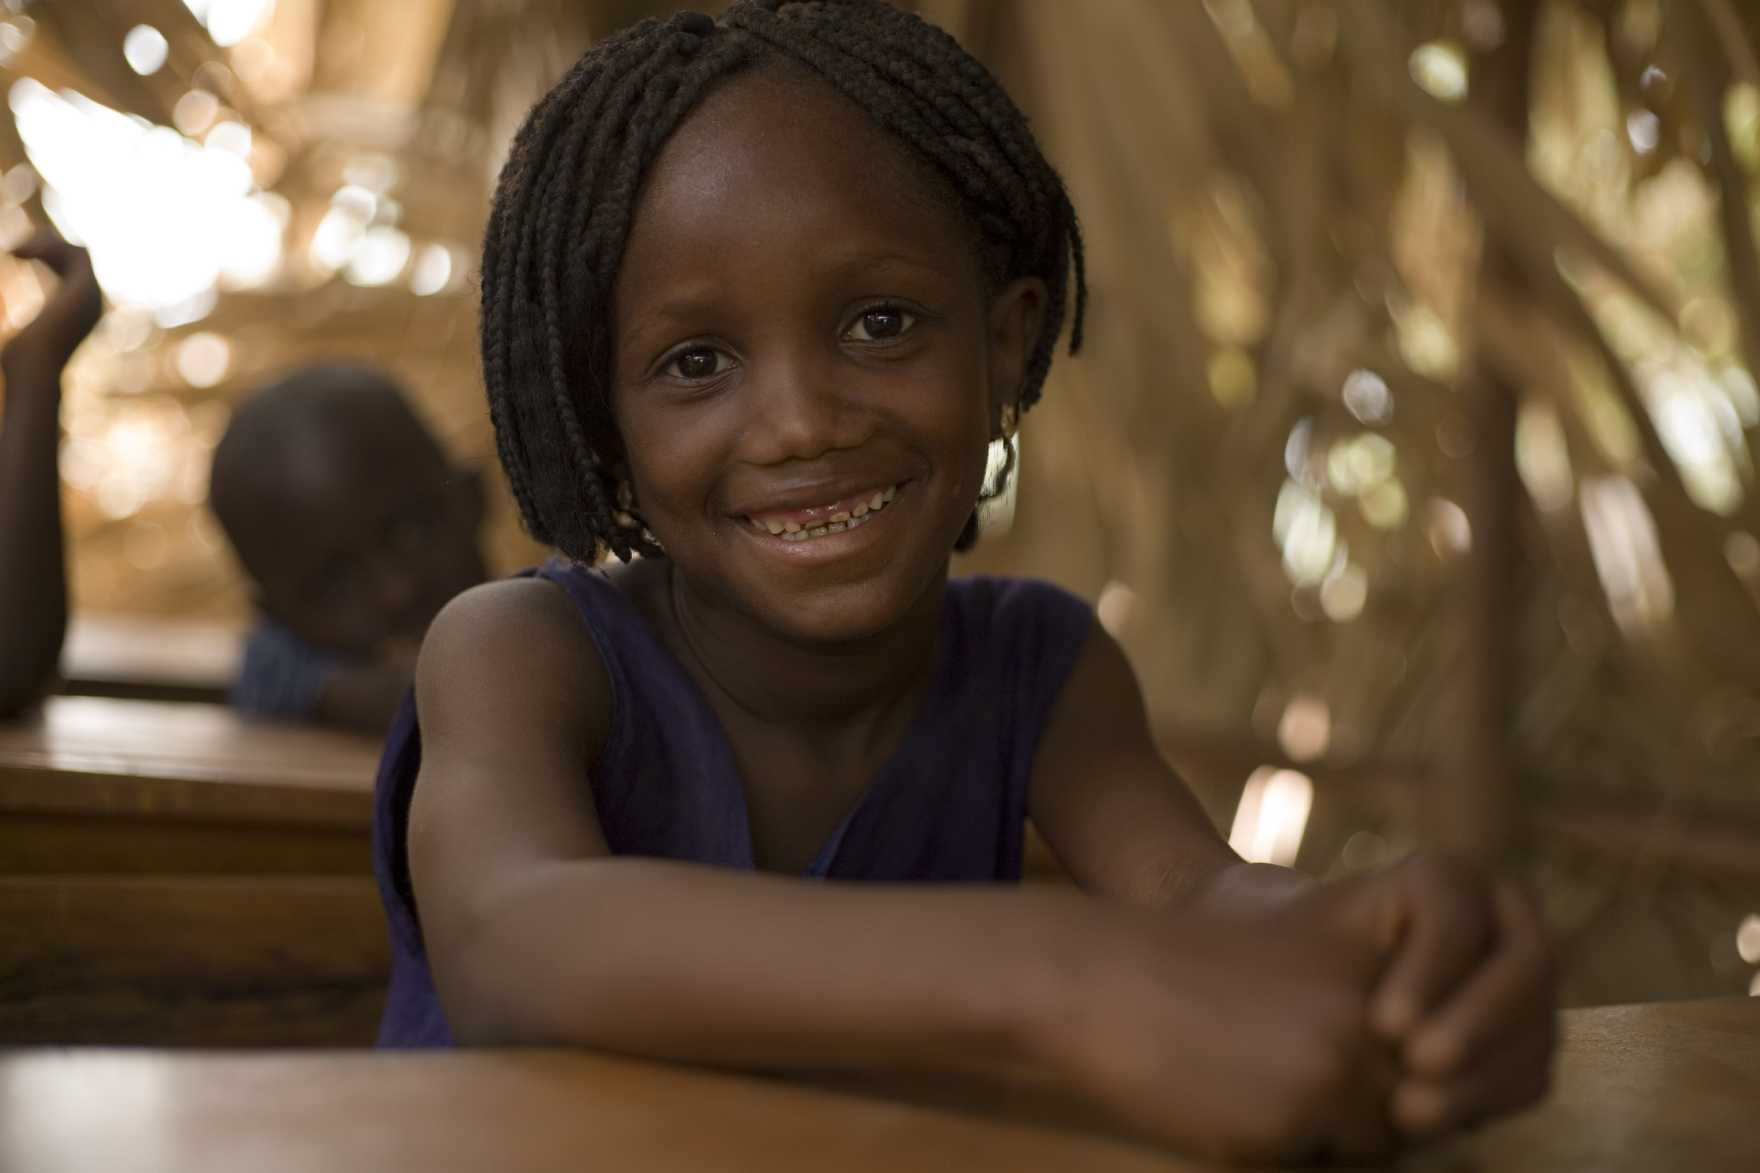 Fotio: UNICEF/ Asselin